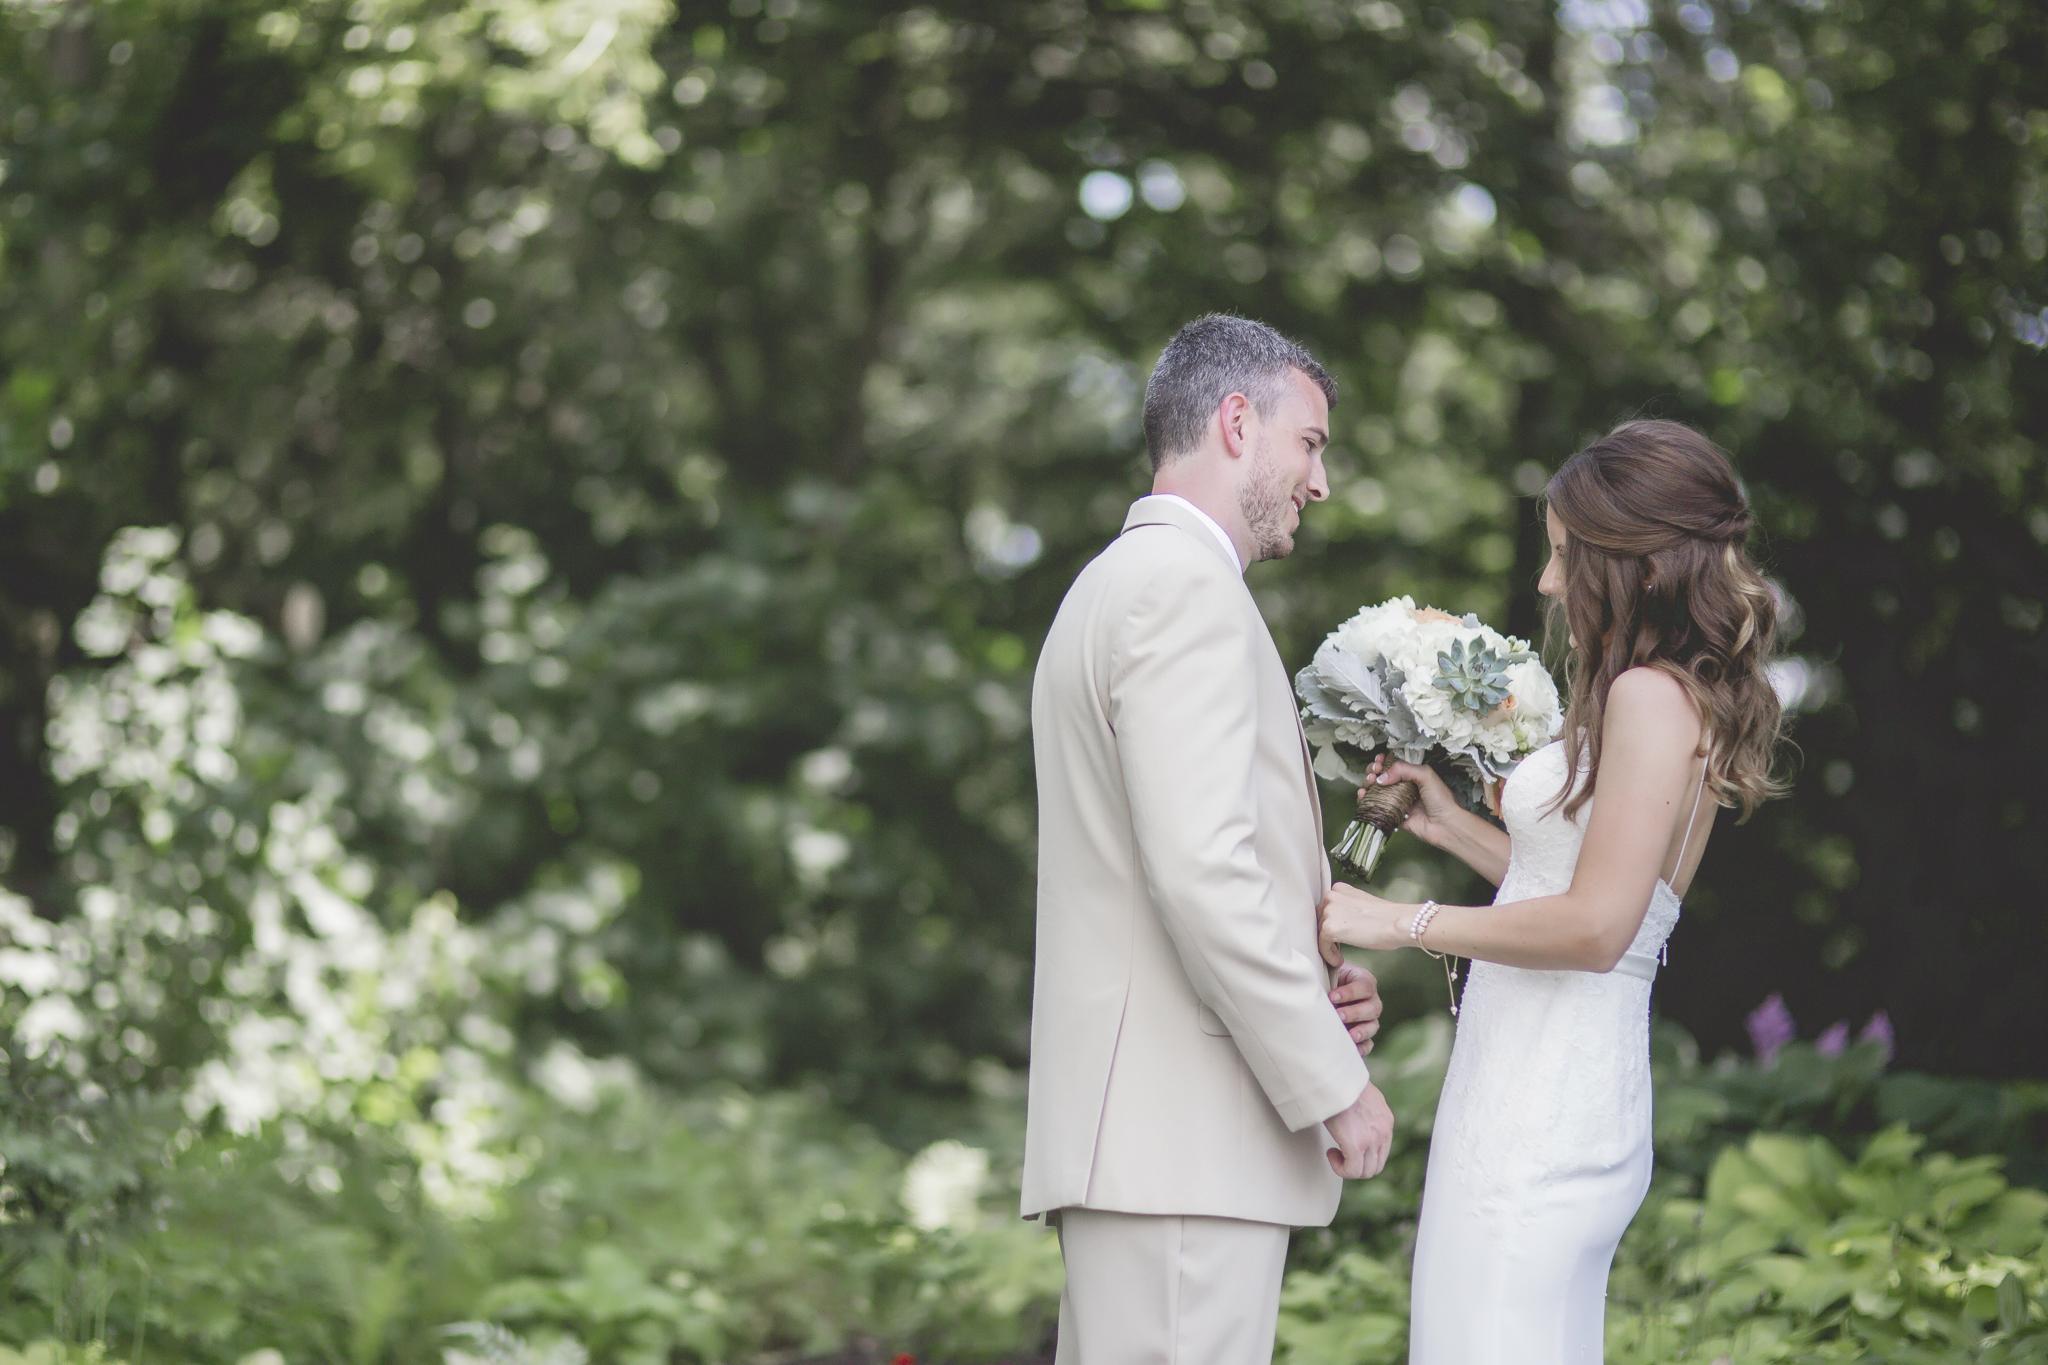 minneapolis wedding photographer-6.jpg